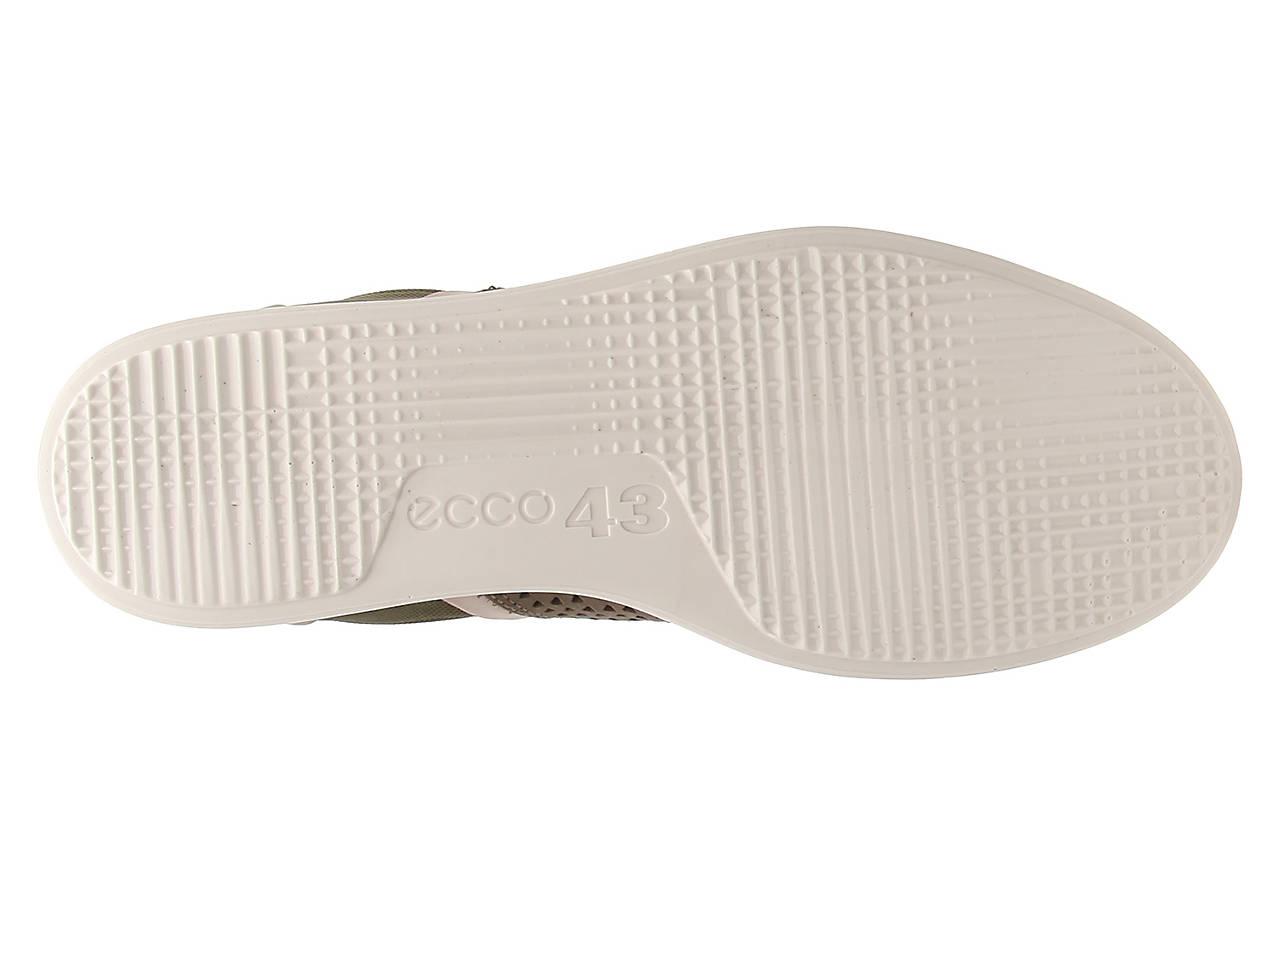 Sonderteil beste Sammlung Laufschuhe ECCO Collin 2.0 Sneaker Men's Shoes   DSW